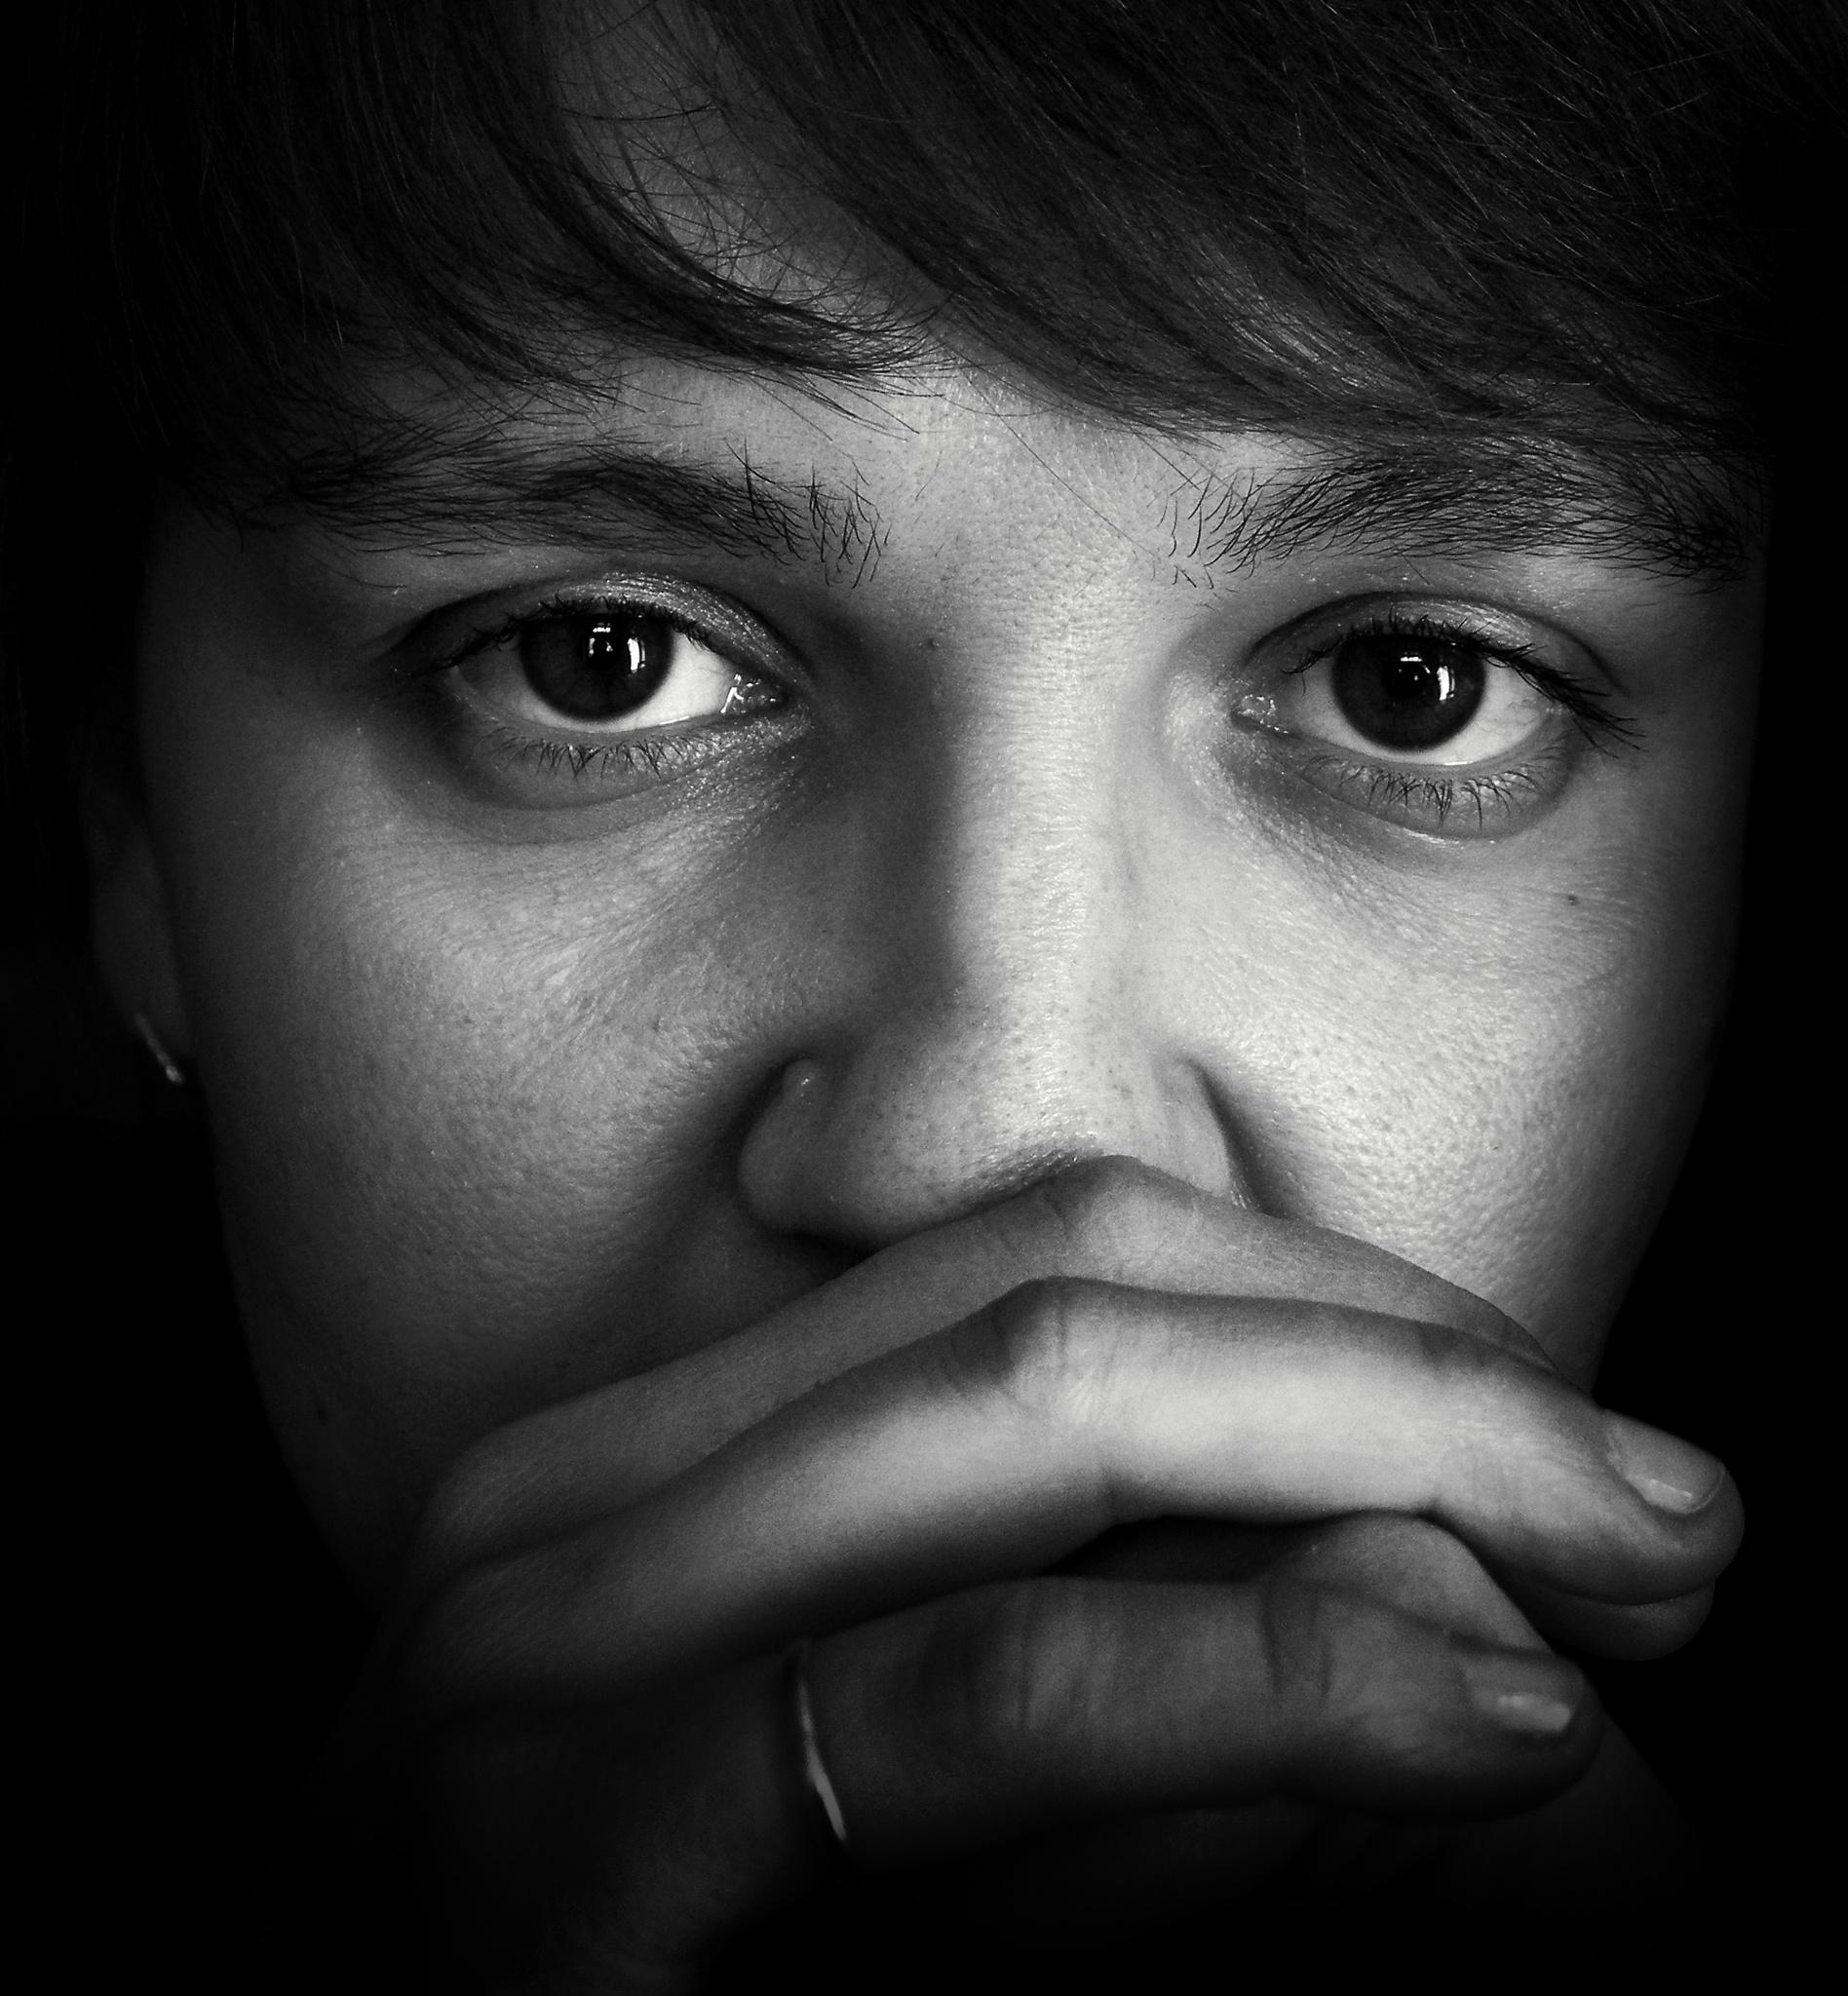 In her eyes asleep rain by Сергей Юрьев